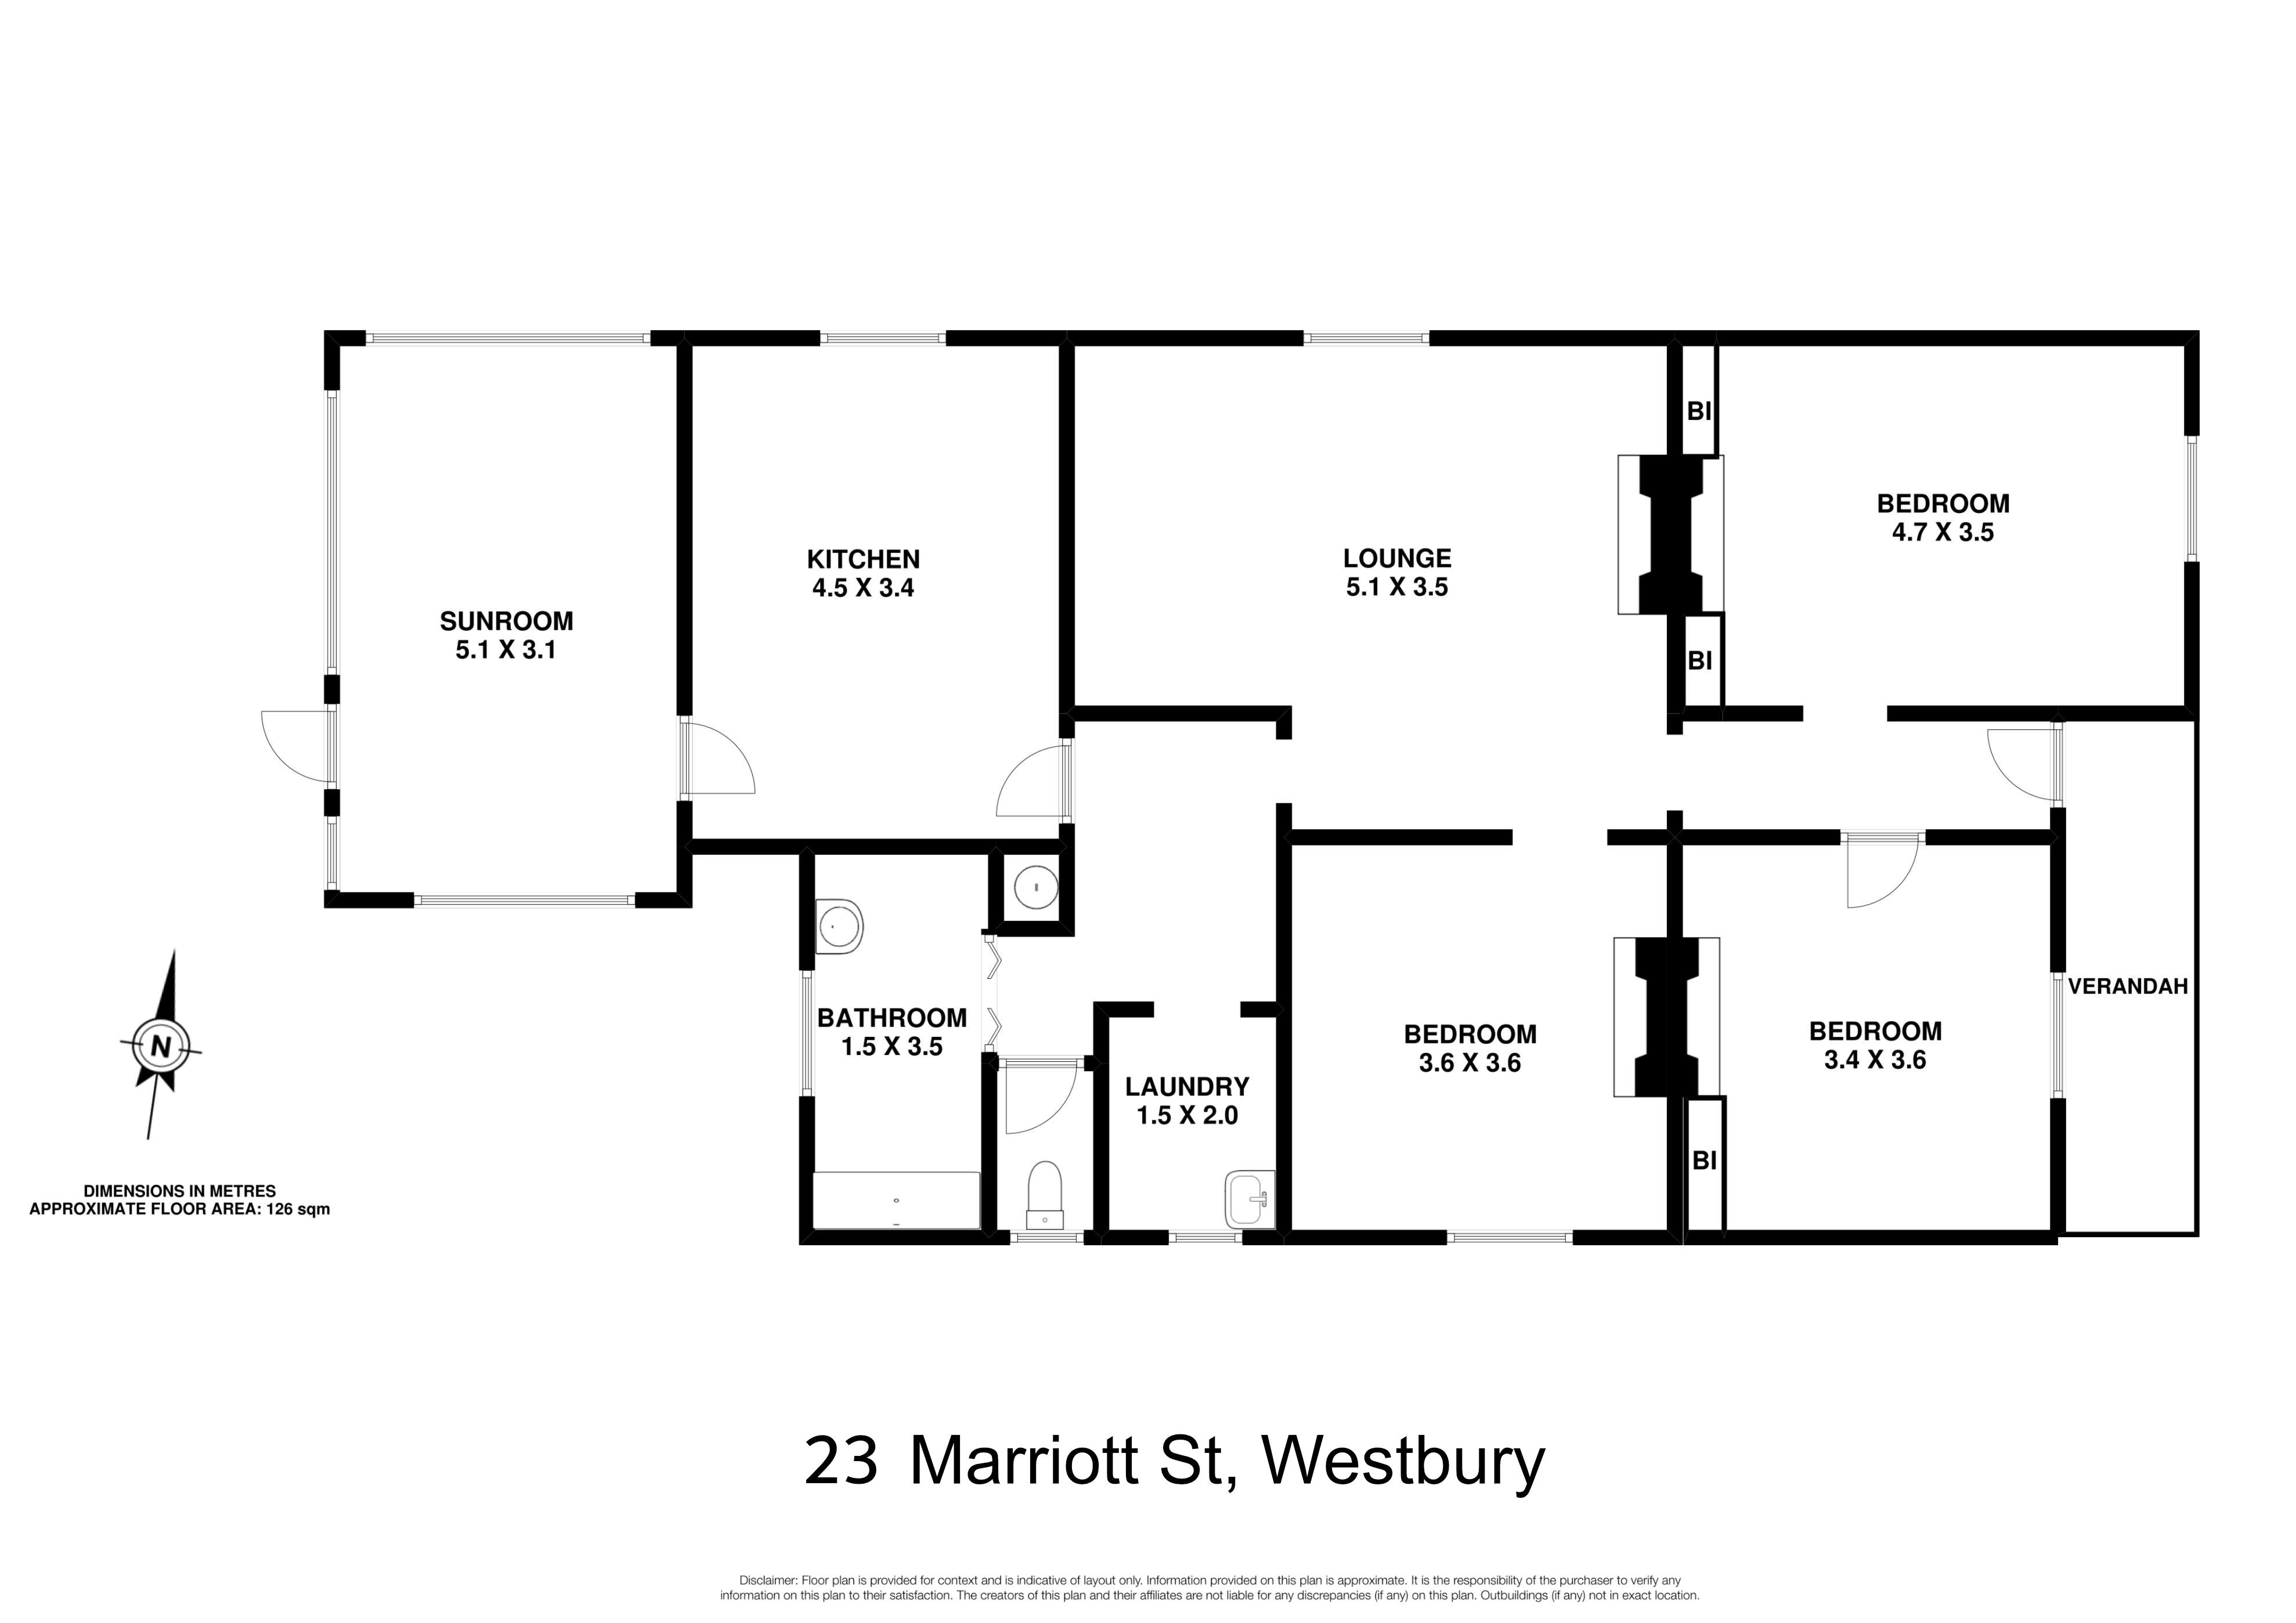 23 Marriott Street, Westbury